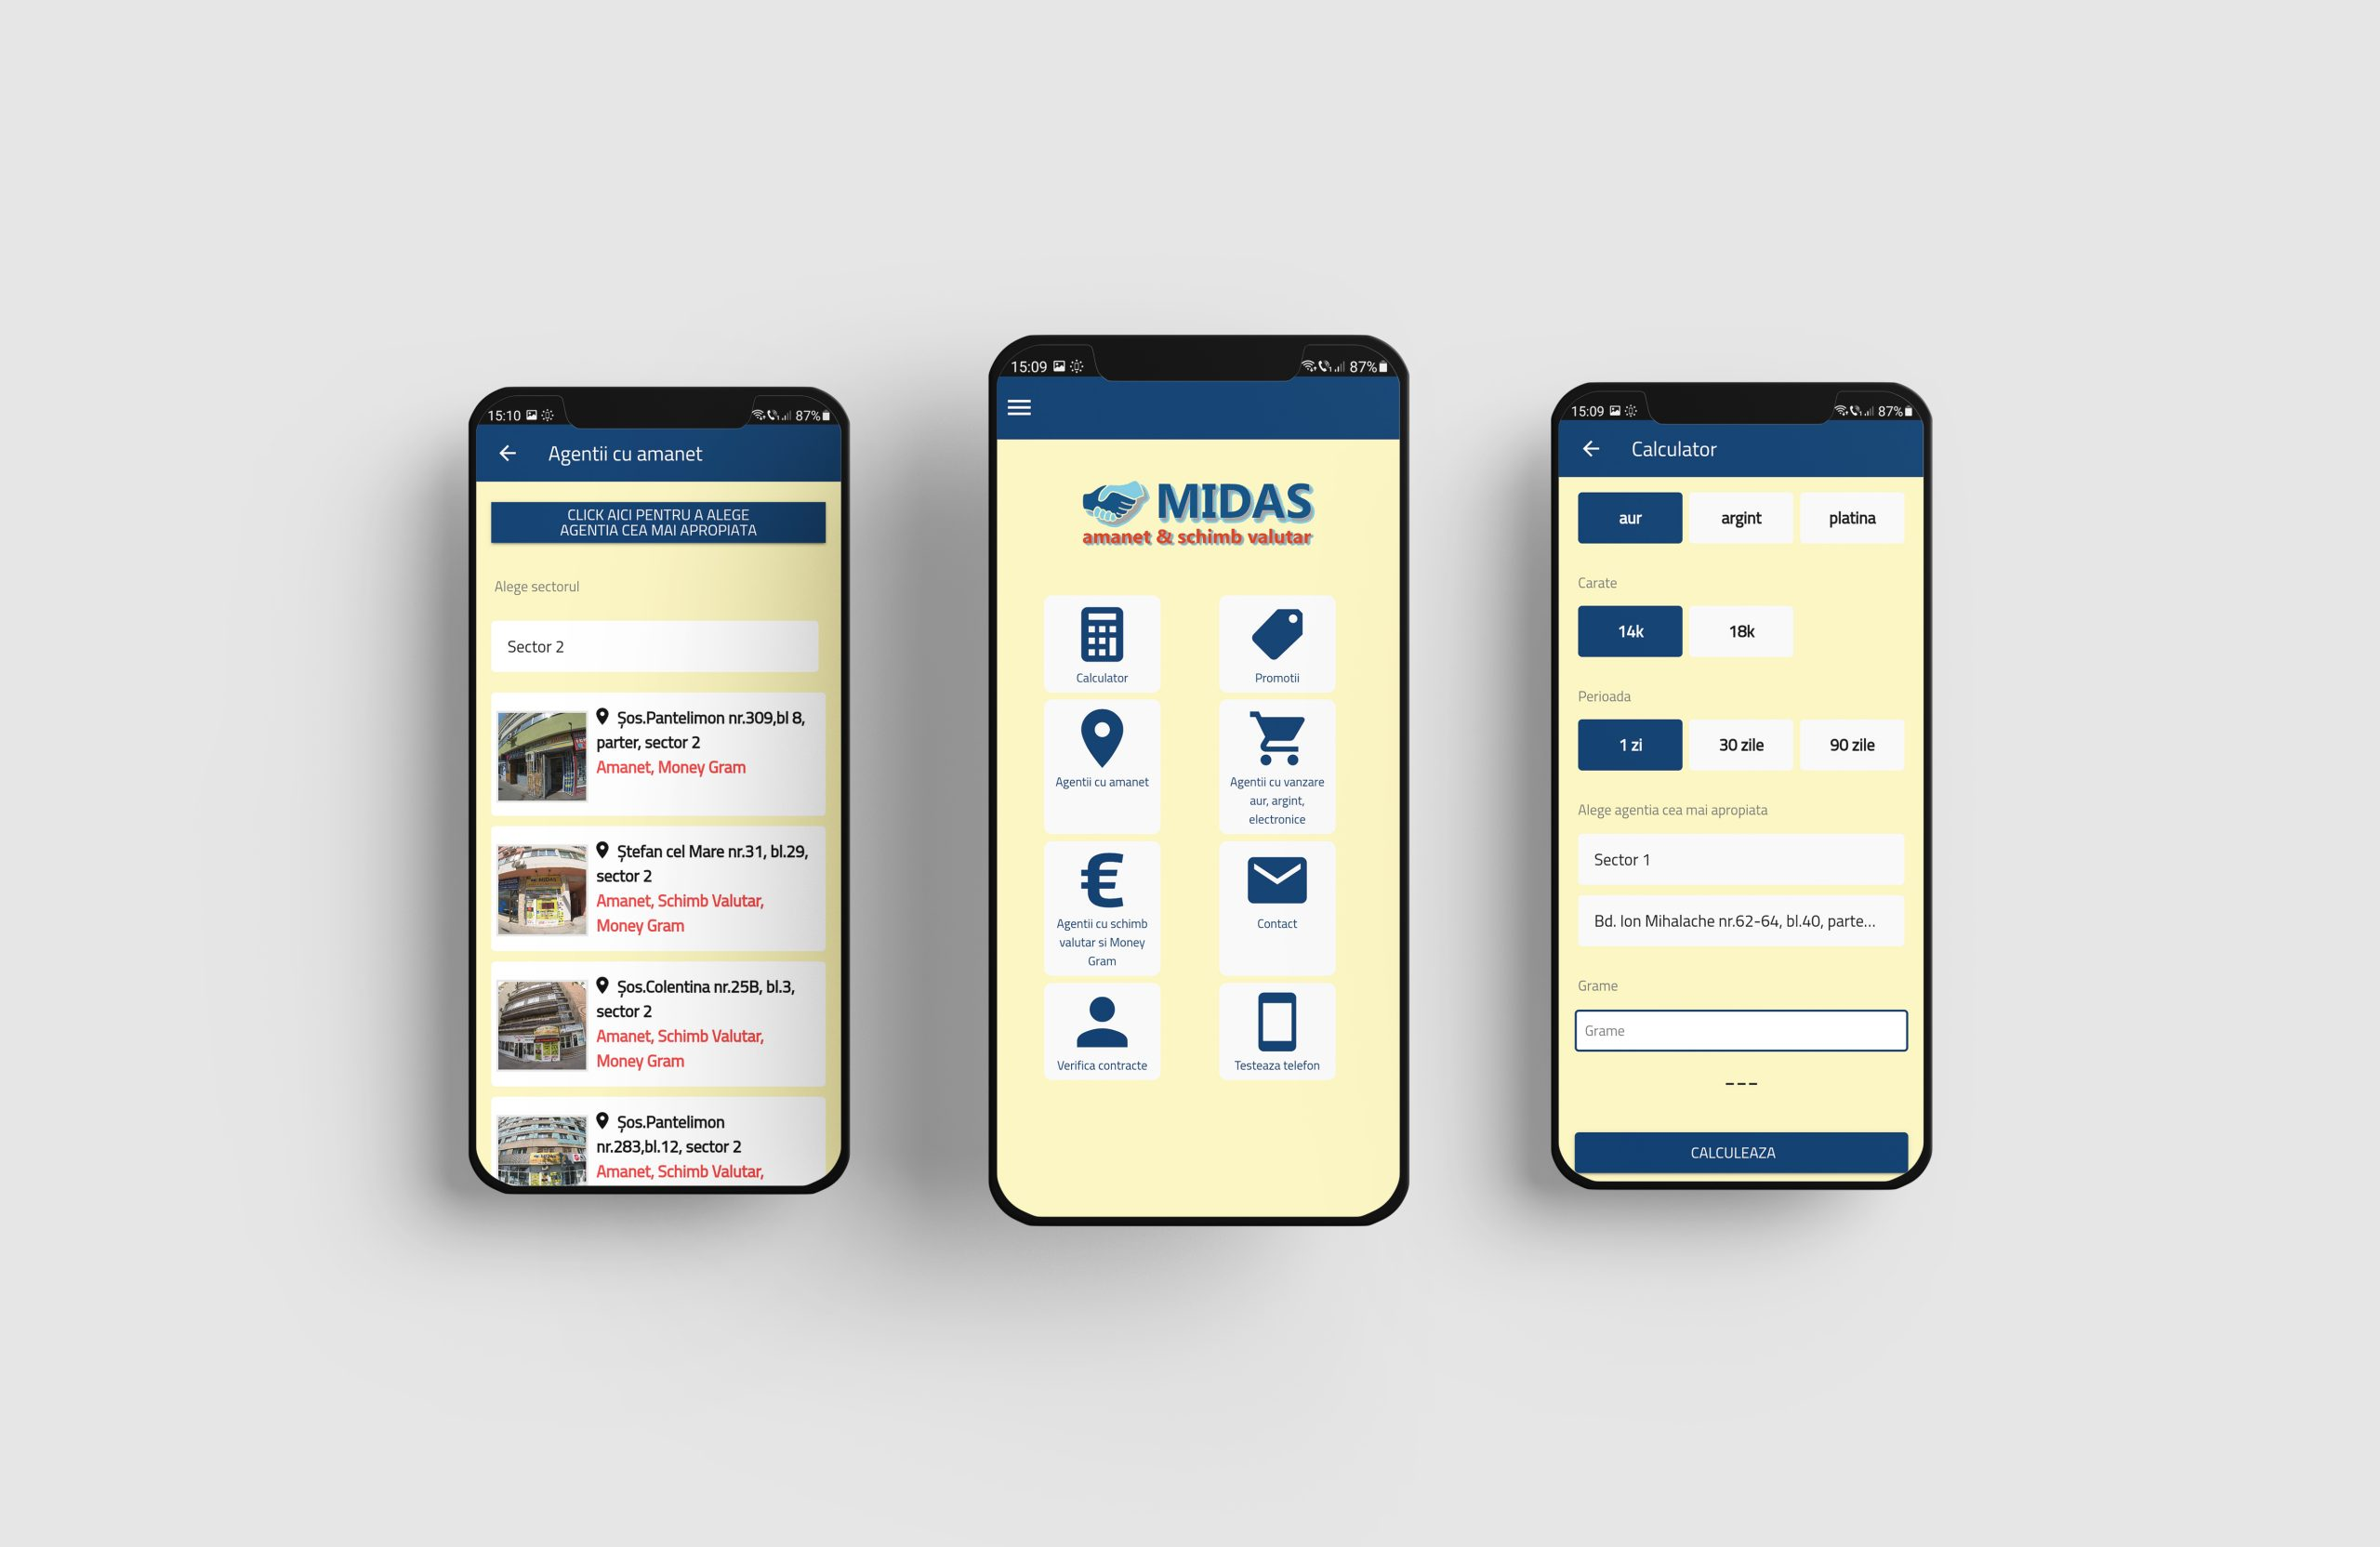 midas-amanet-app-screens